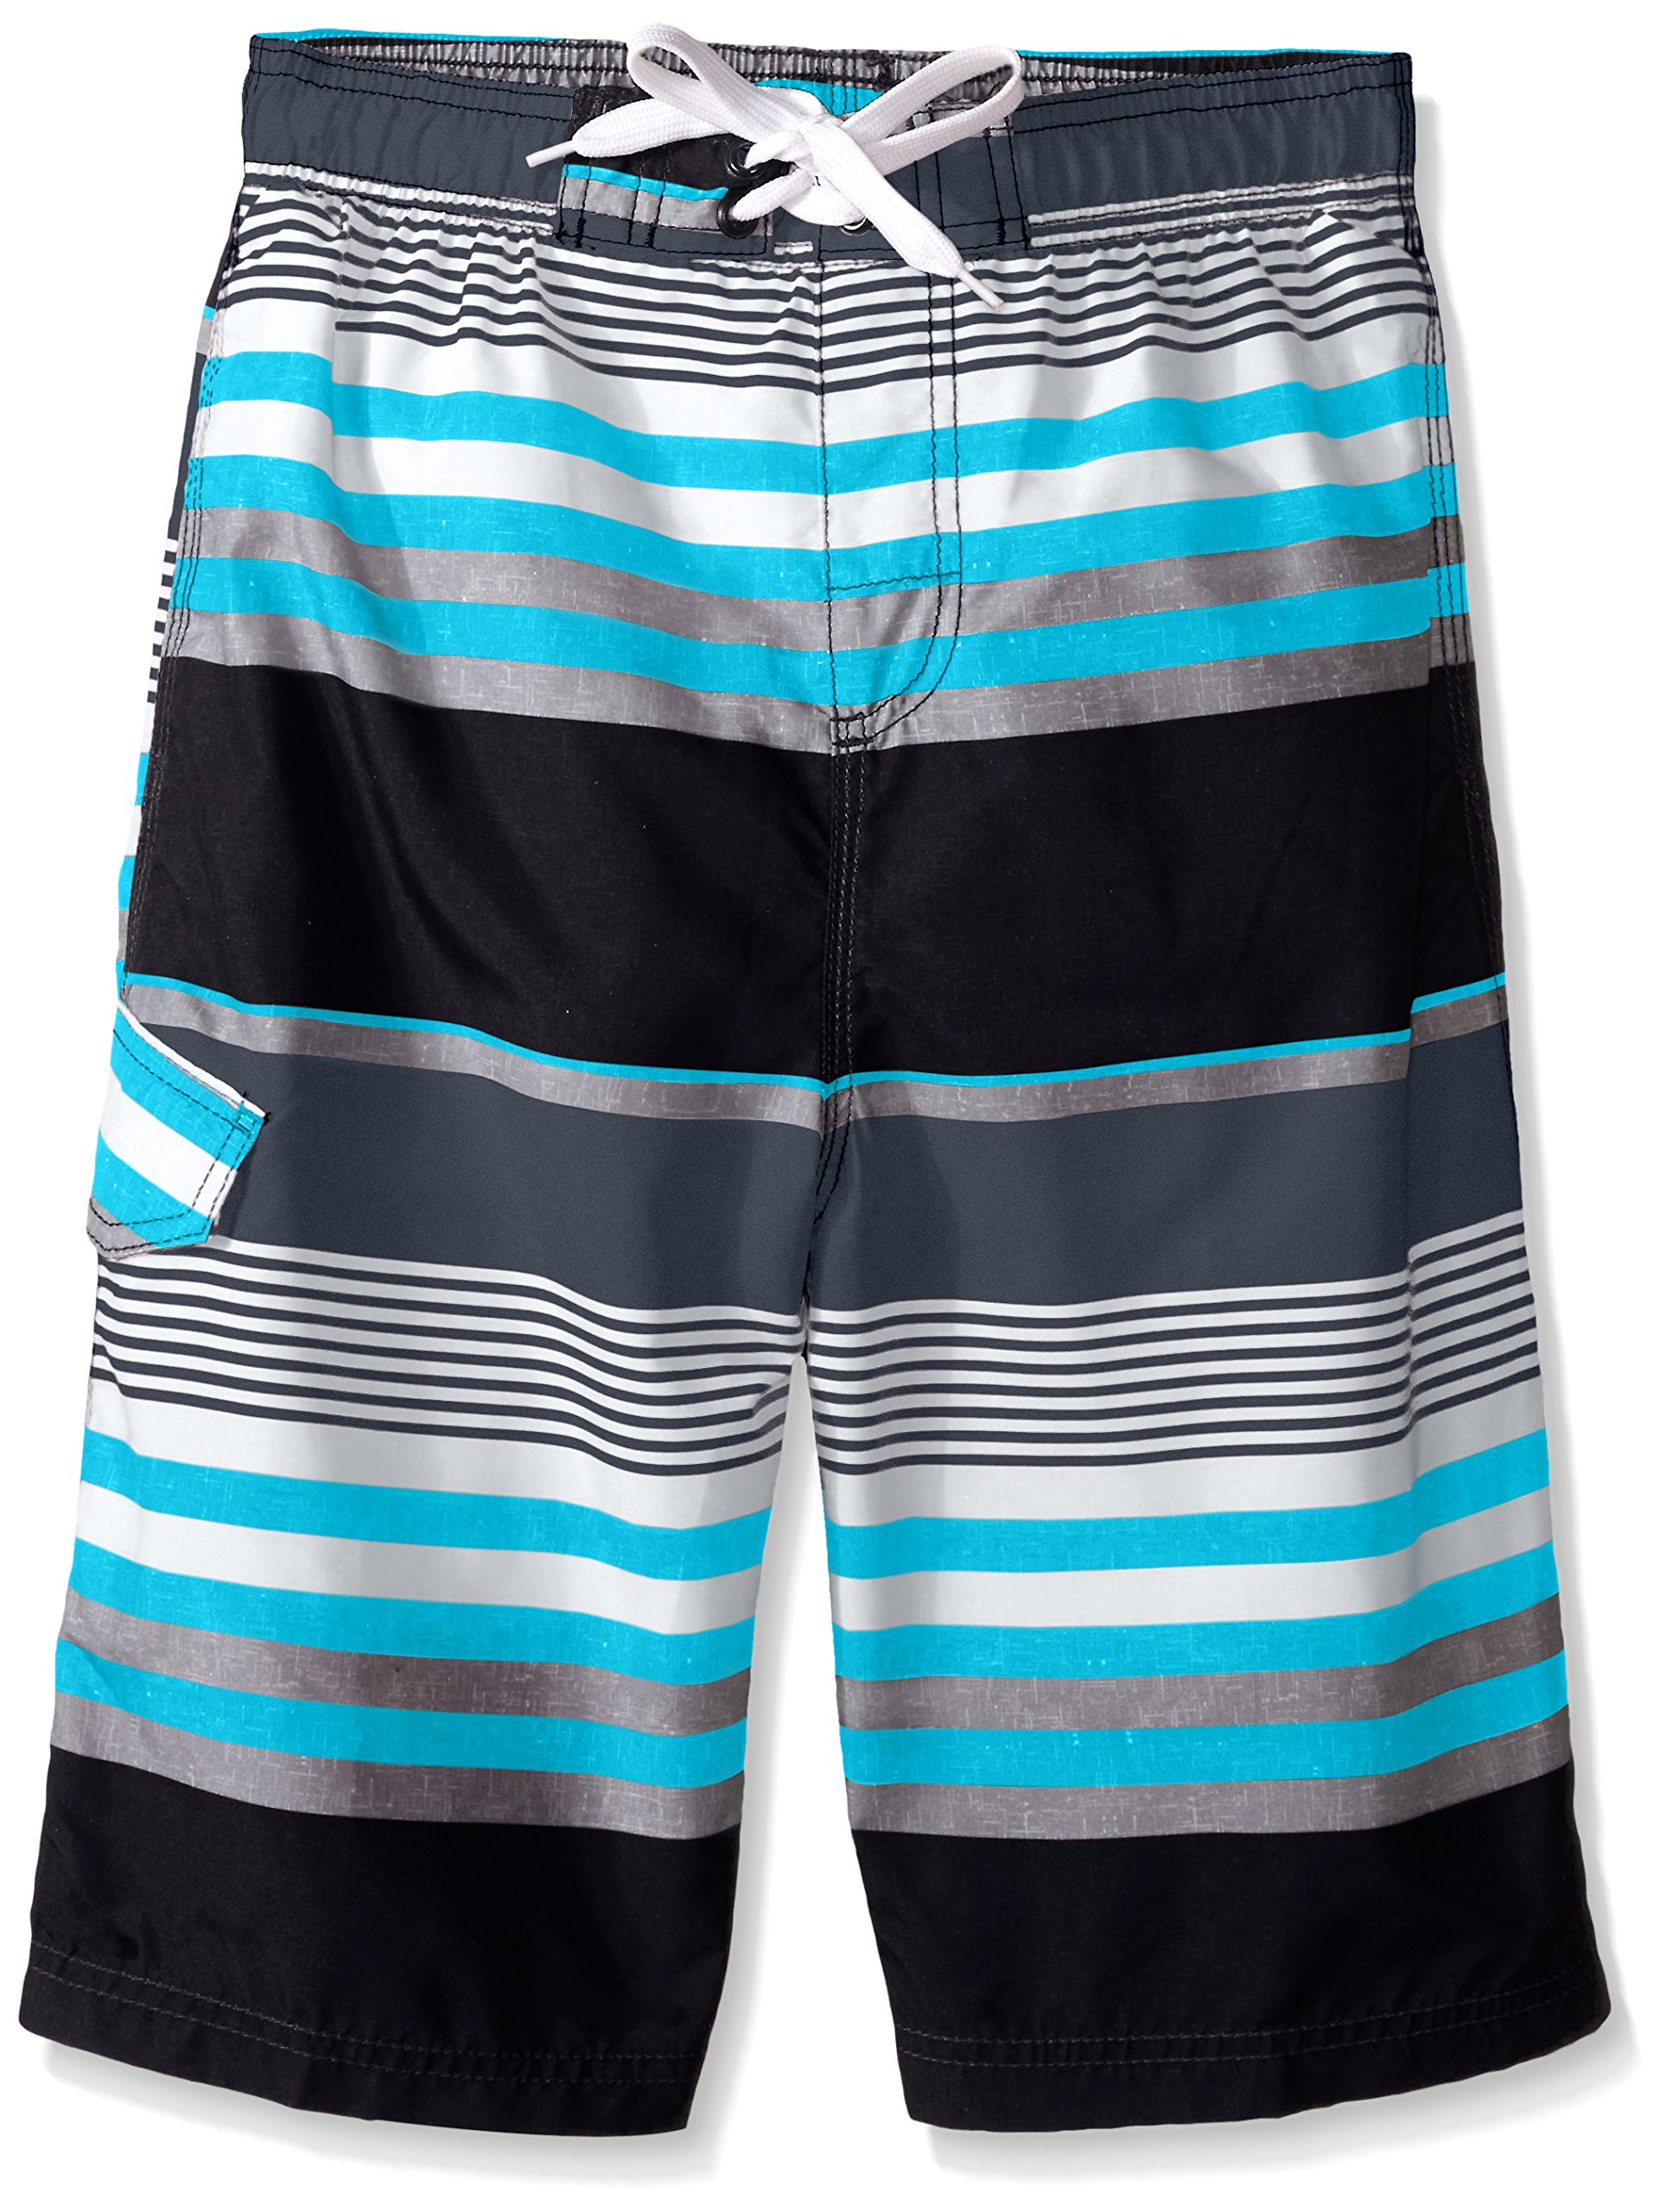 Kanu Surf Big Boys' Optic Quick Dry Beach Swim Trunk, Black/Aqua, Large (14/16)